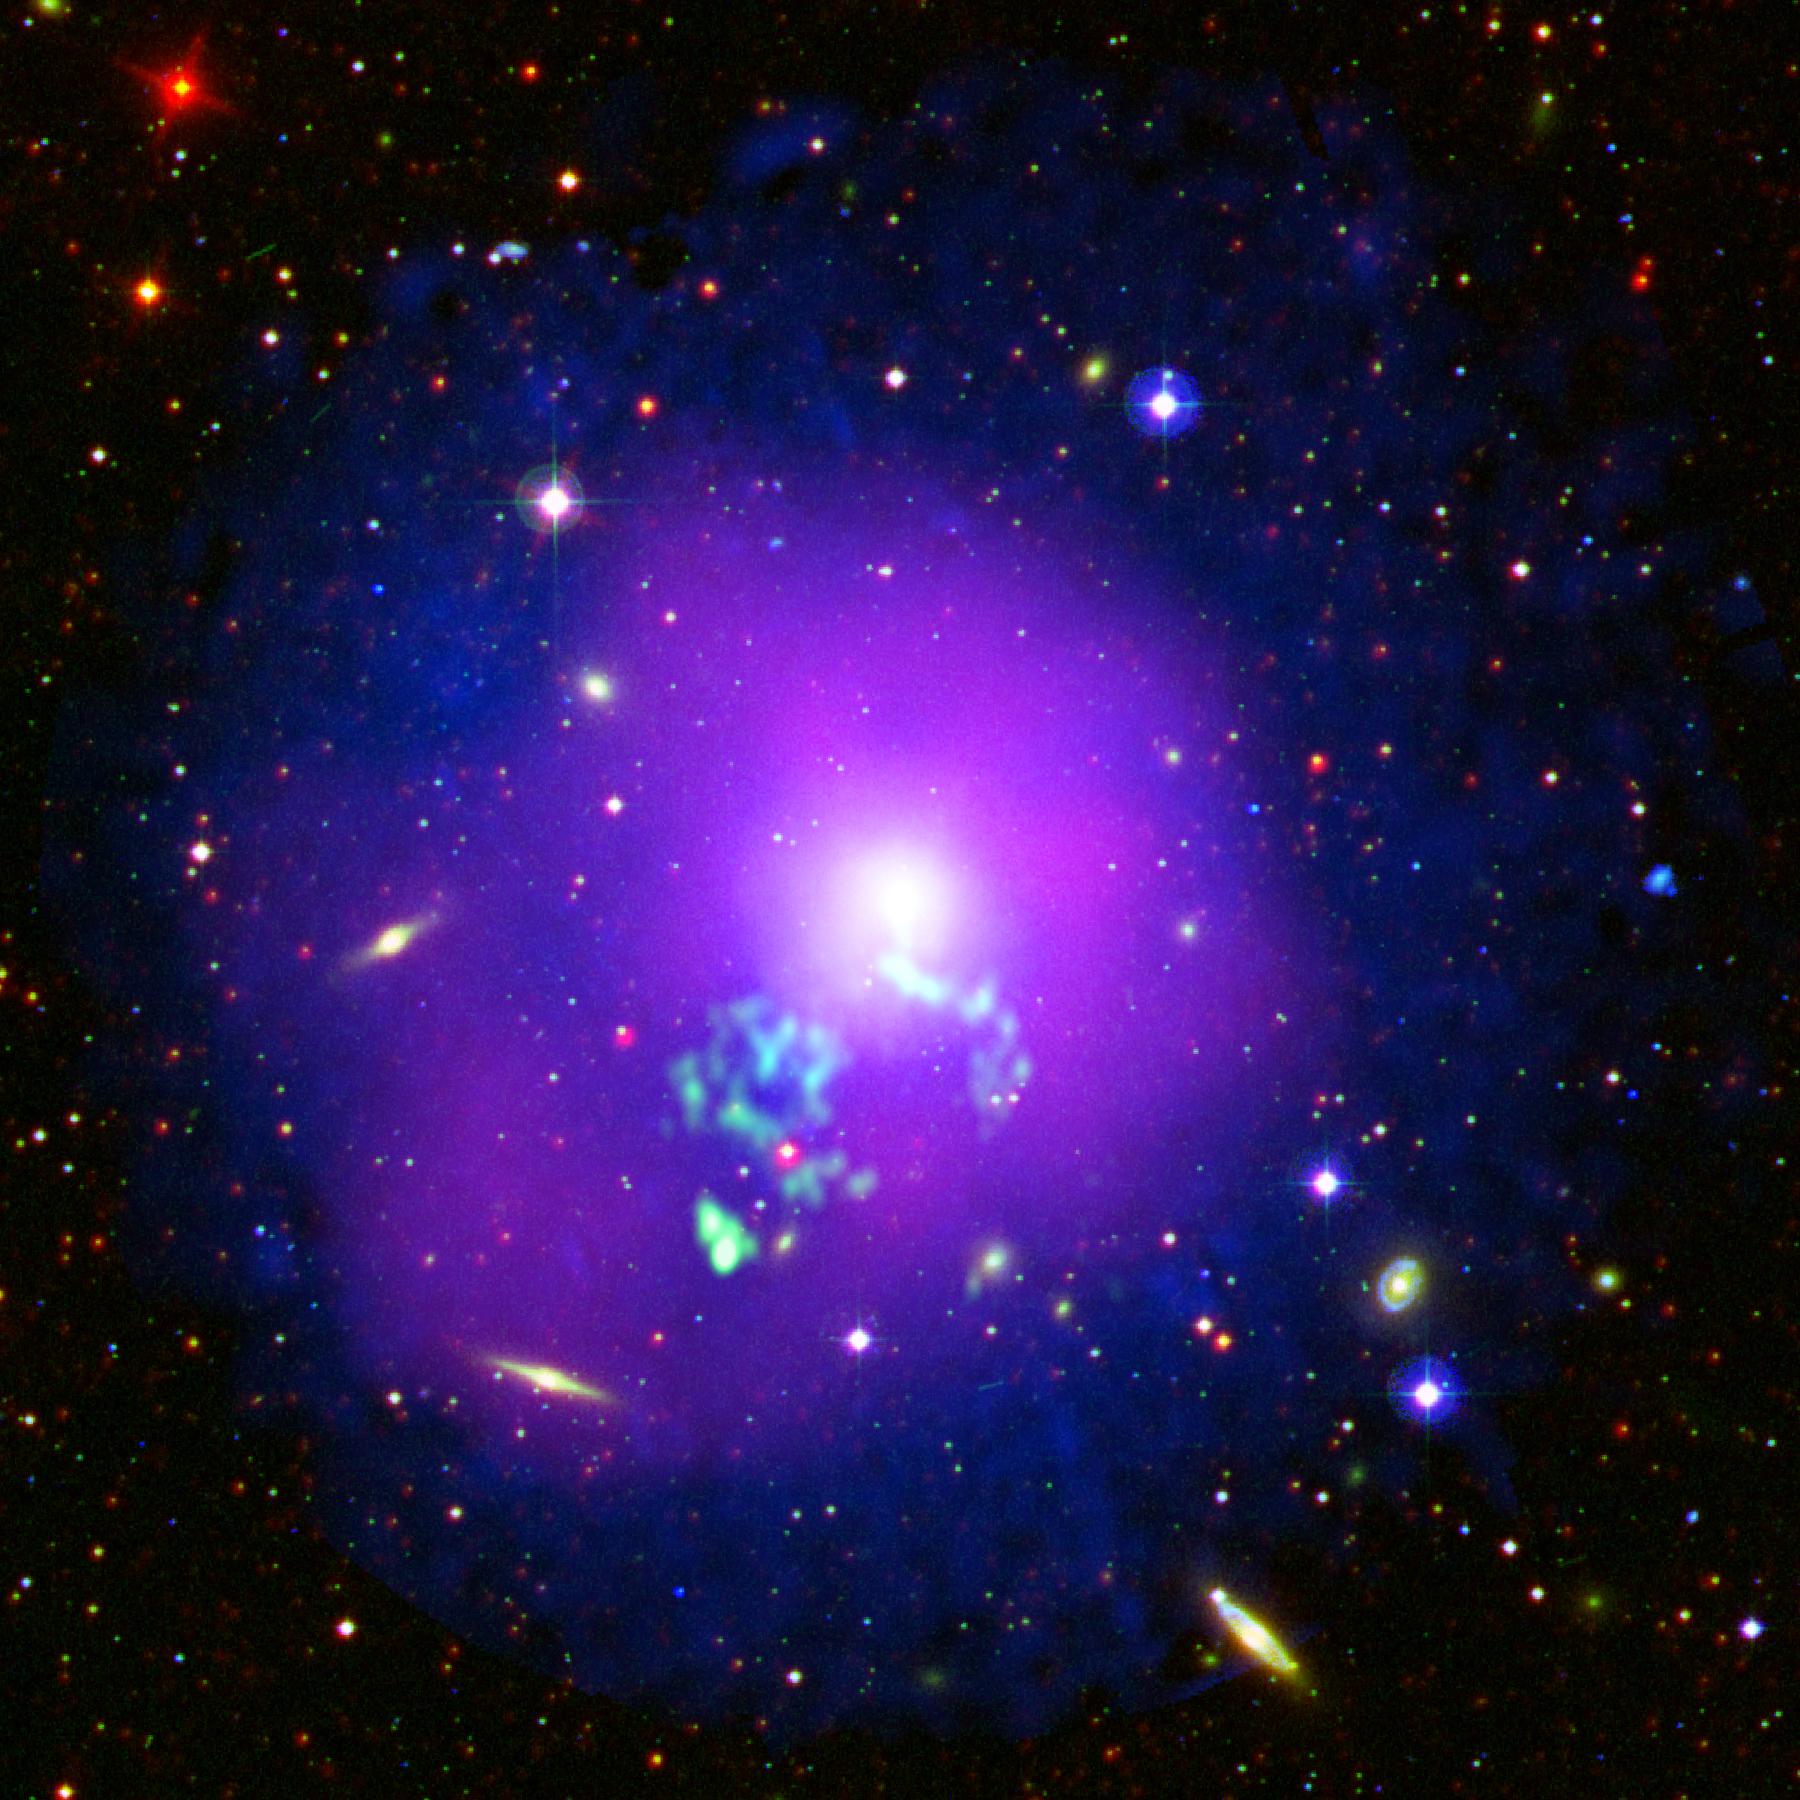 Hot_gas_sloshing_in_a_galactic_cauldron.jpg